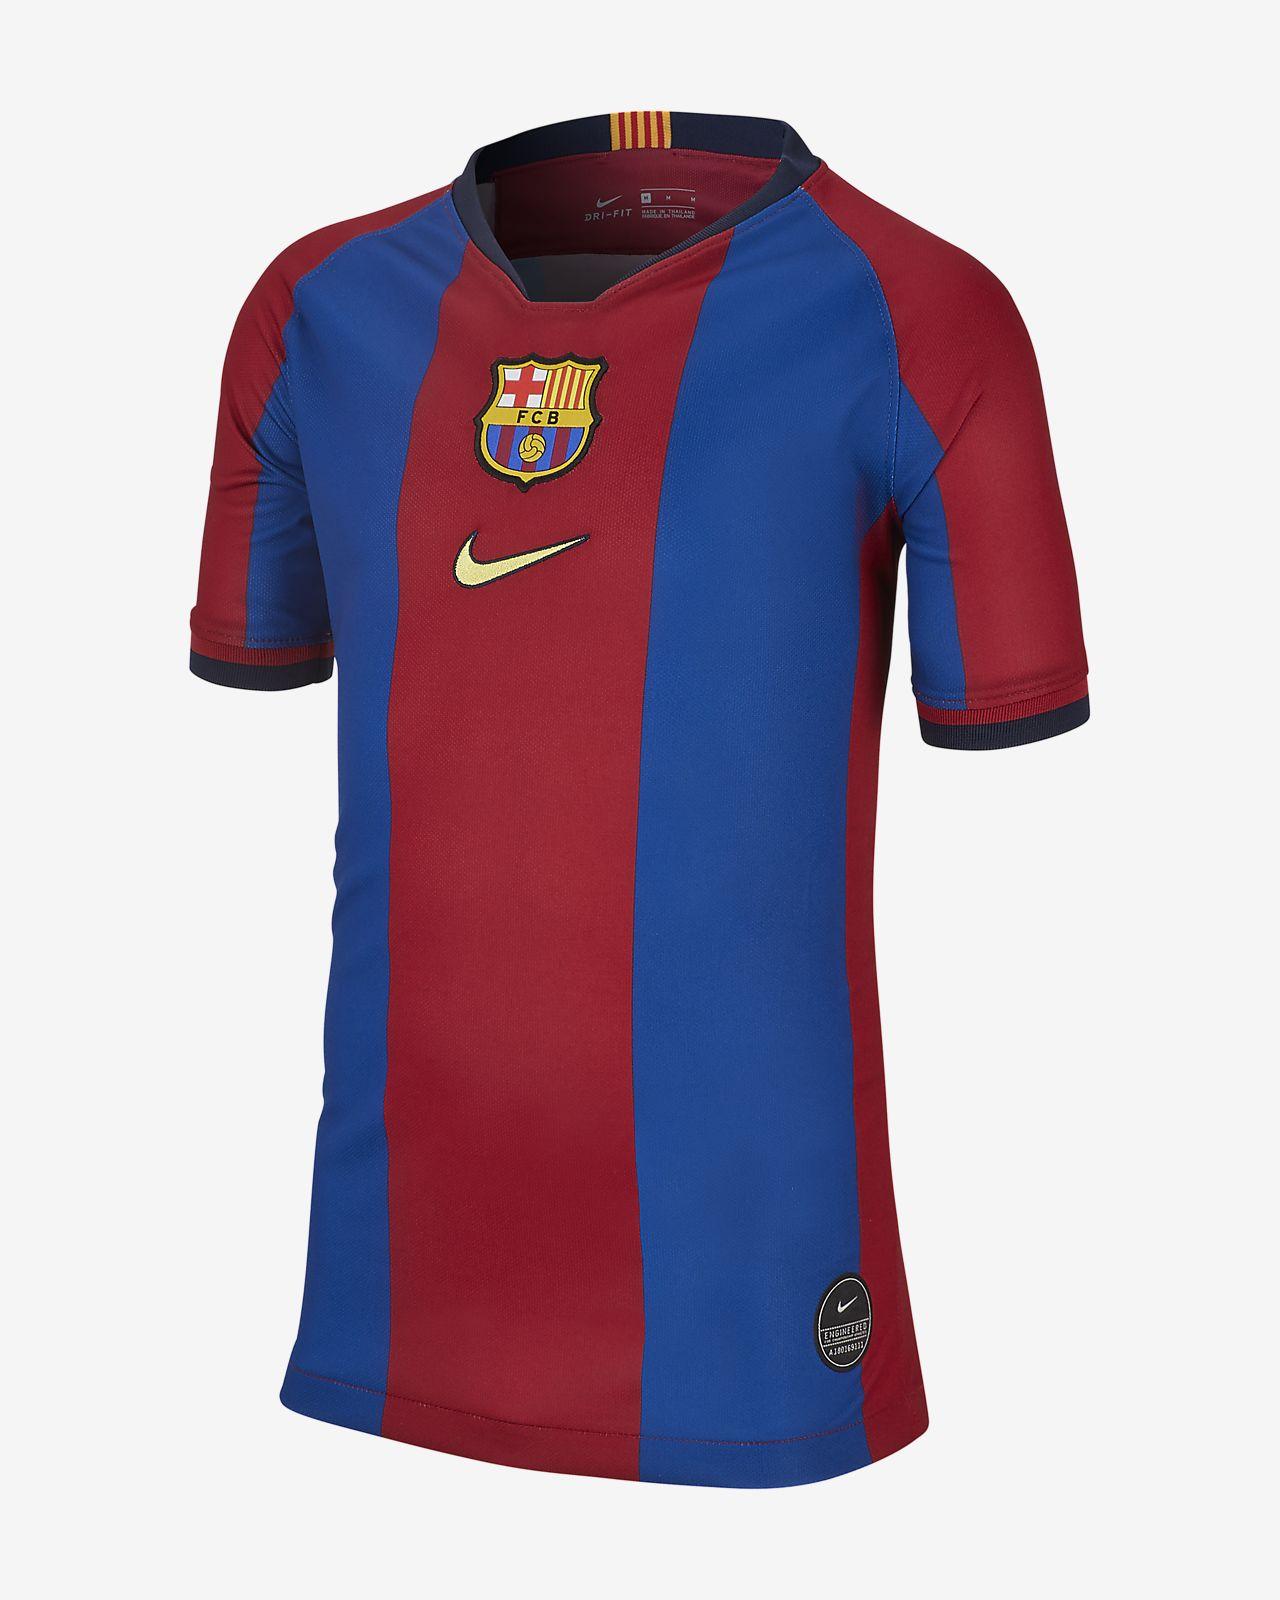 Camiseta para niños talla grande FC Barcelona Stadium '98/99